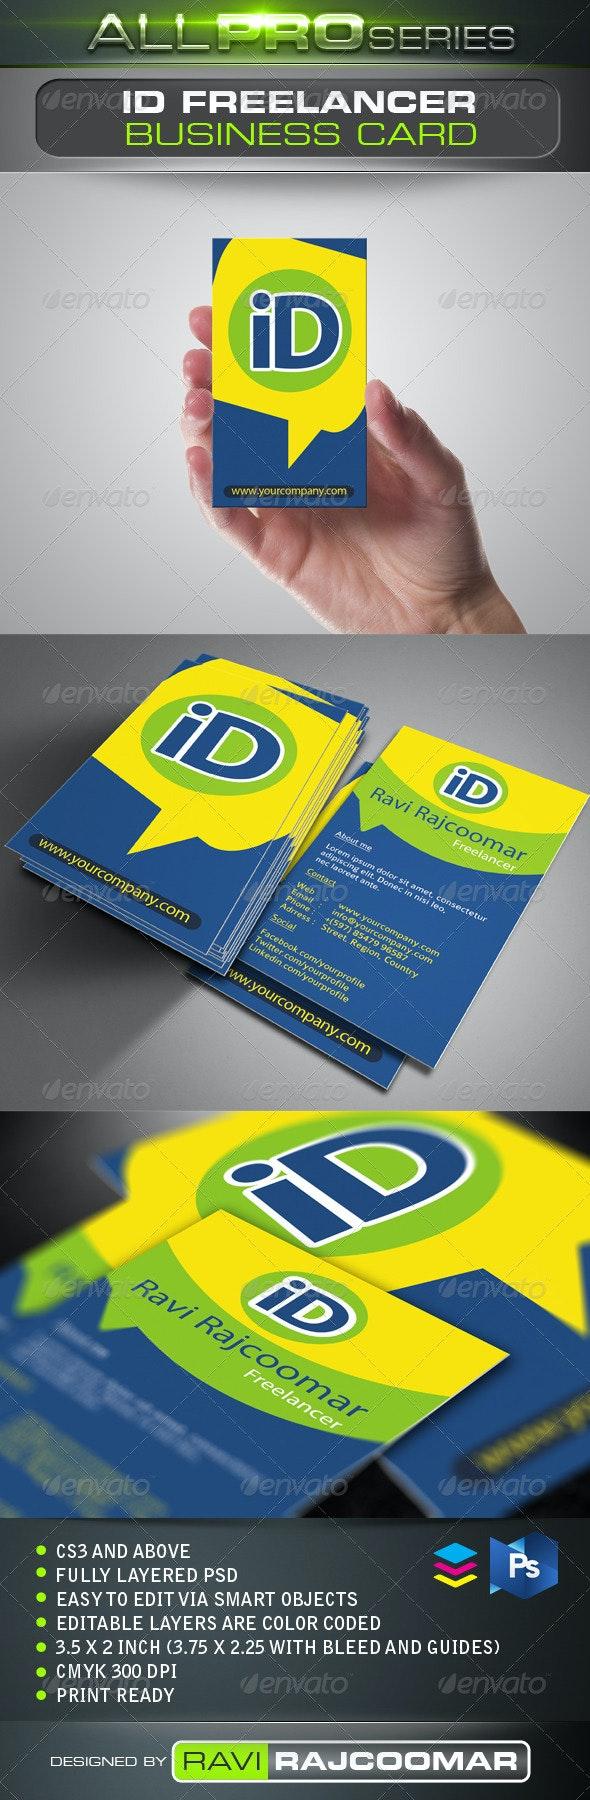 ID Freelancer Business Card - Creative Business Cards